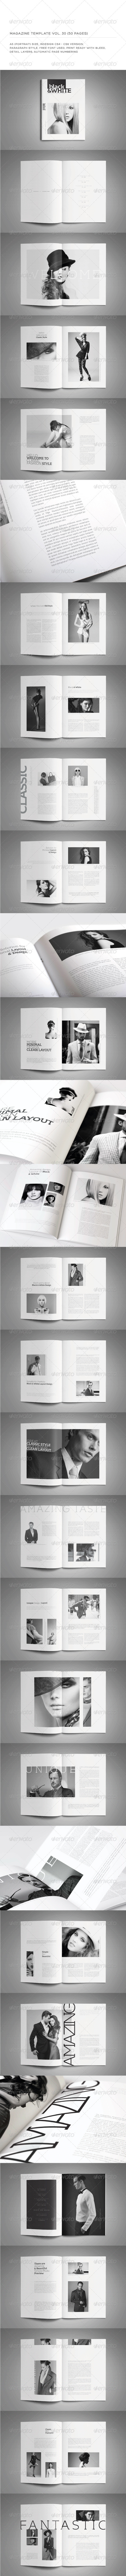 A5 Portrait 50 Pages MGZ (Vol. 30) - Magazines Print Templates